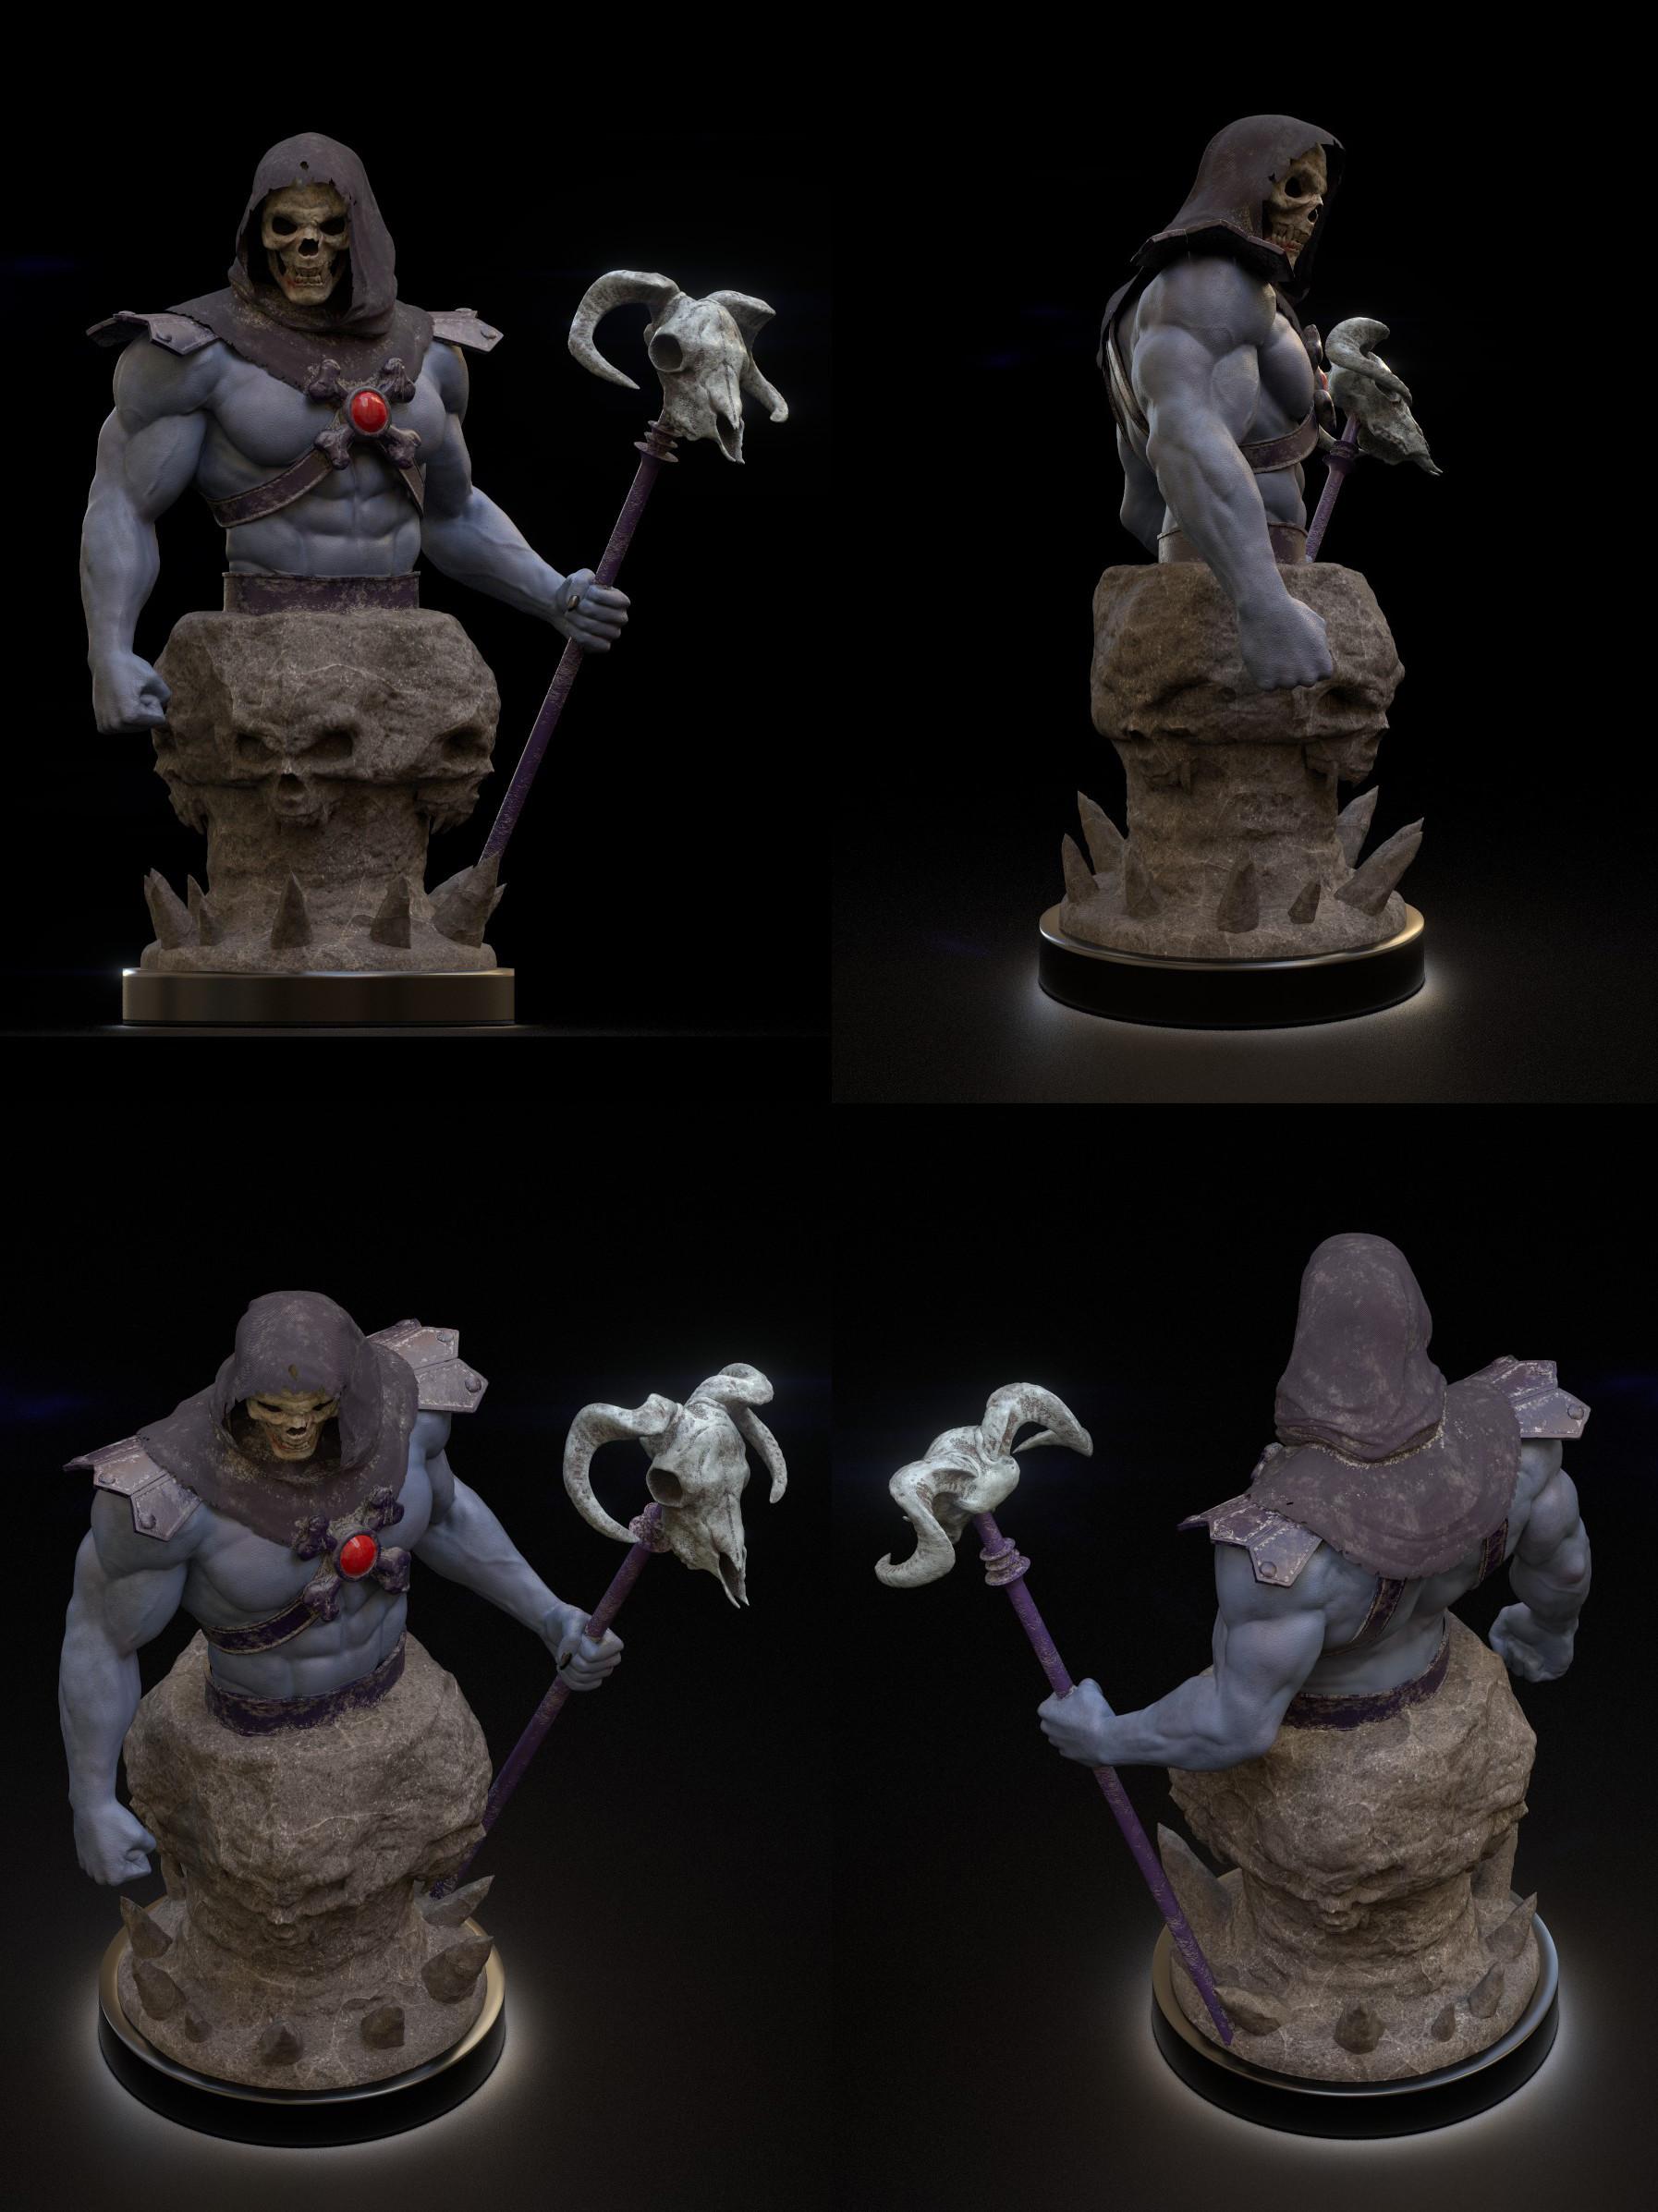 Edgar gomez skeletorvistas2